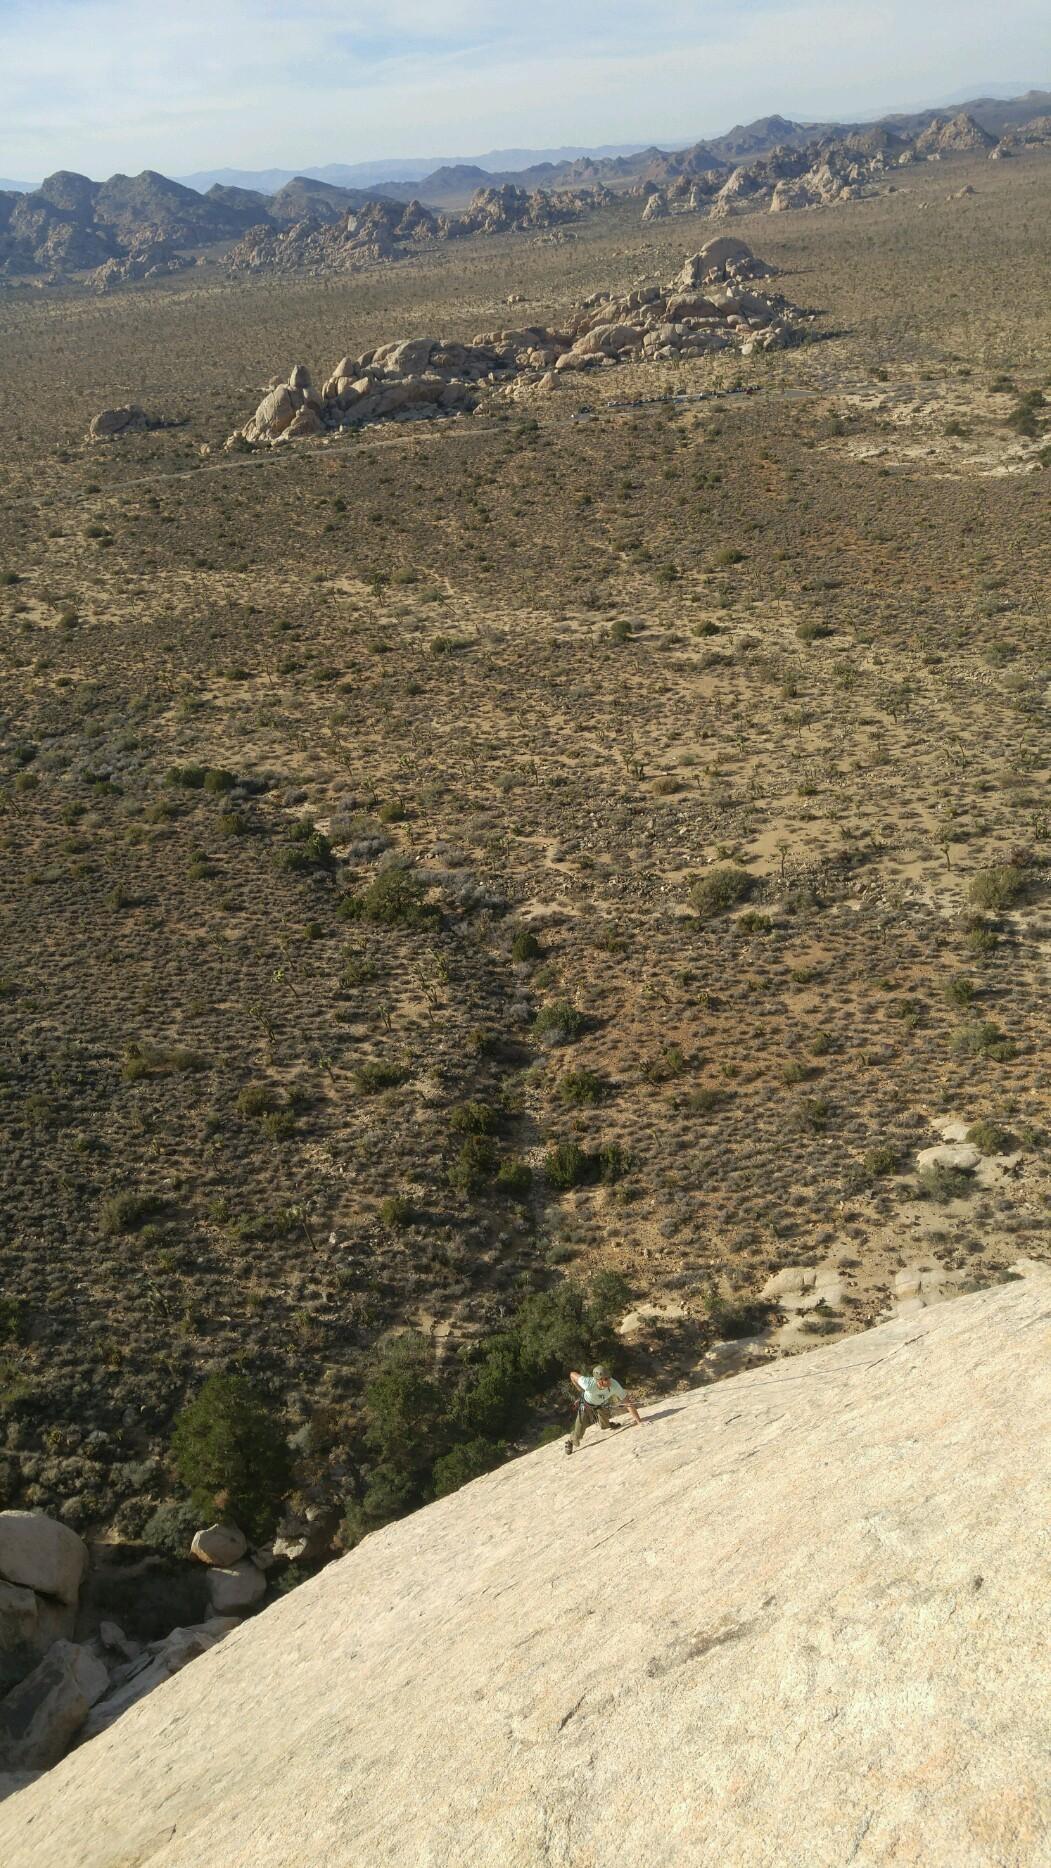 Joshua Tree Multi-Pitch Rock Climbing